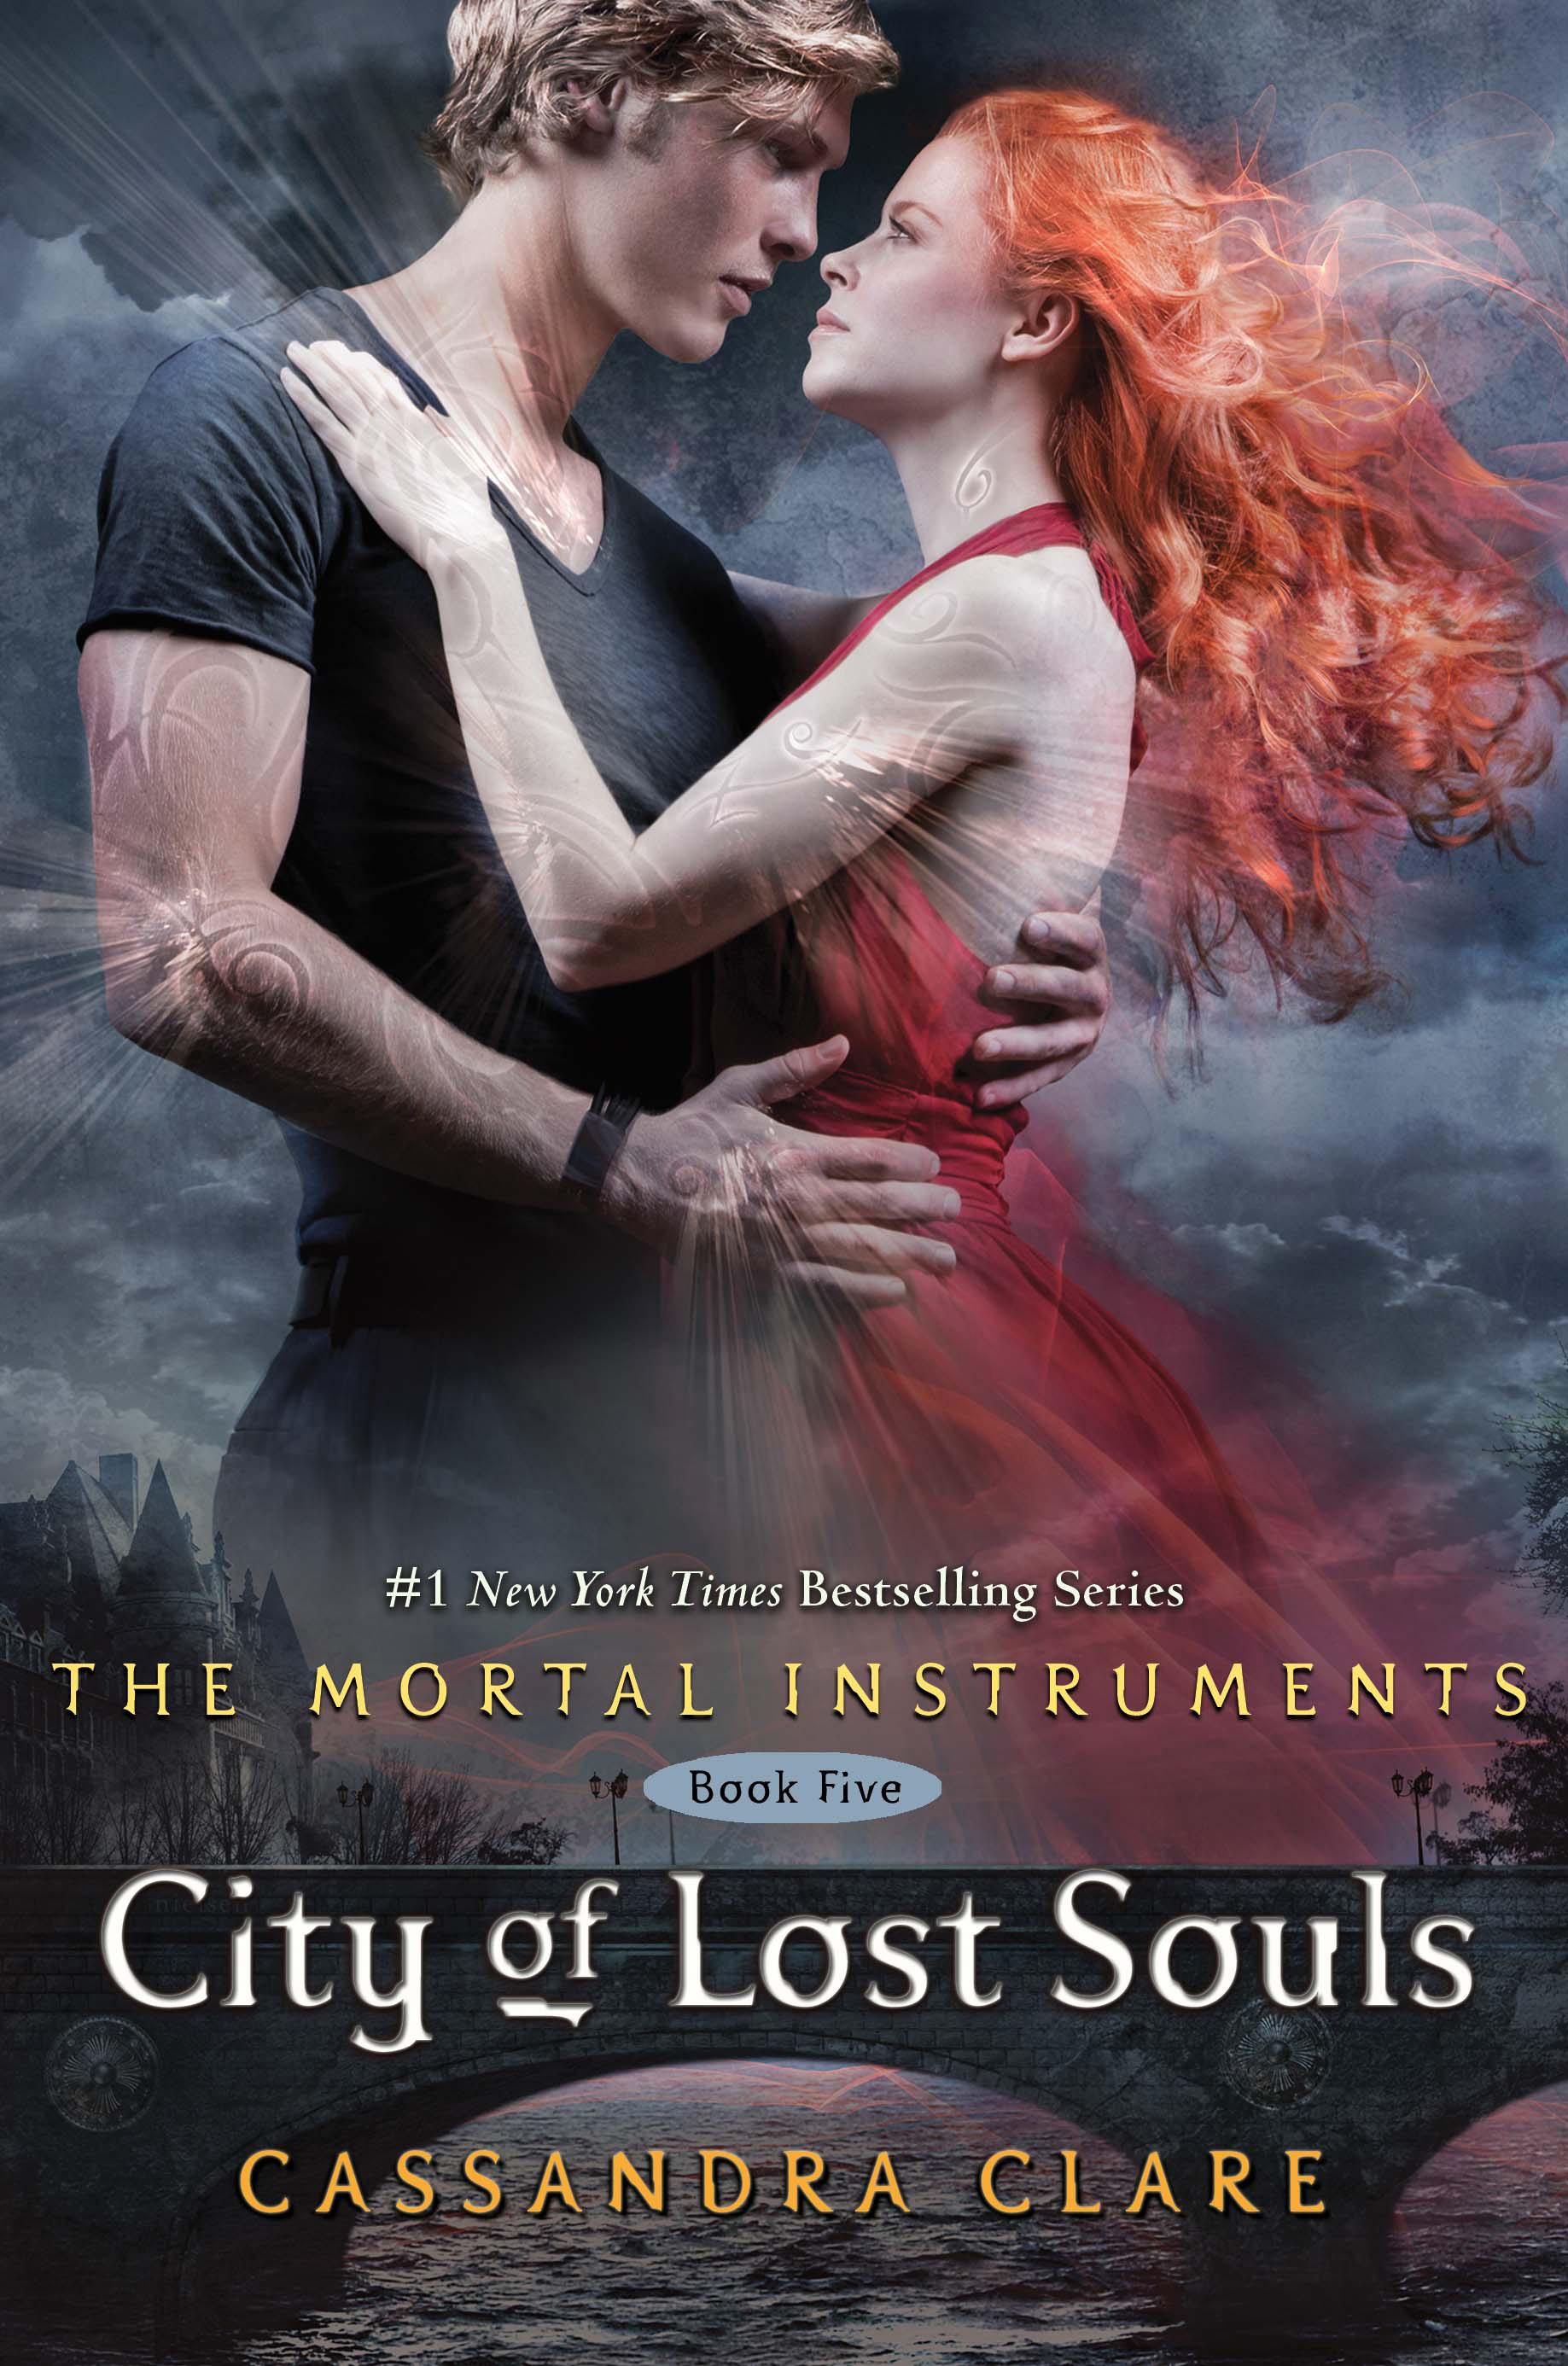 cassandra-clare-city-lost-souls.jpg